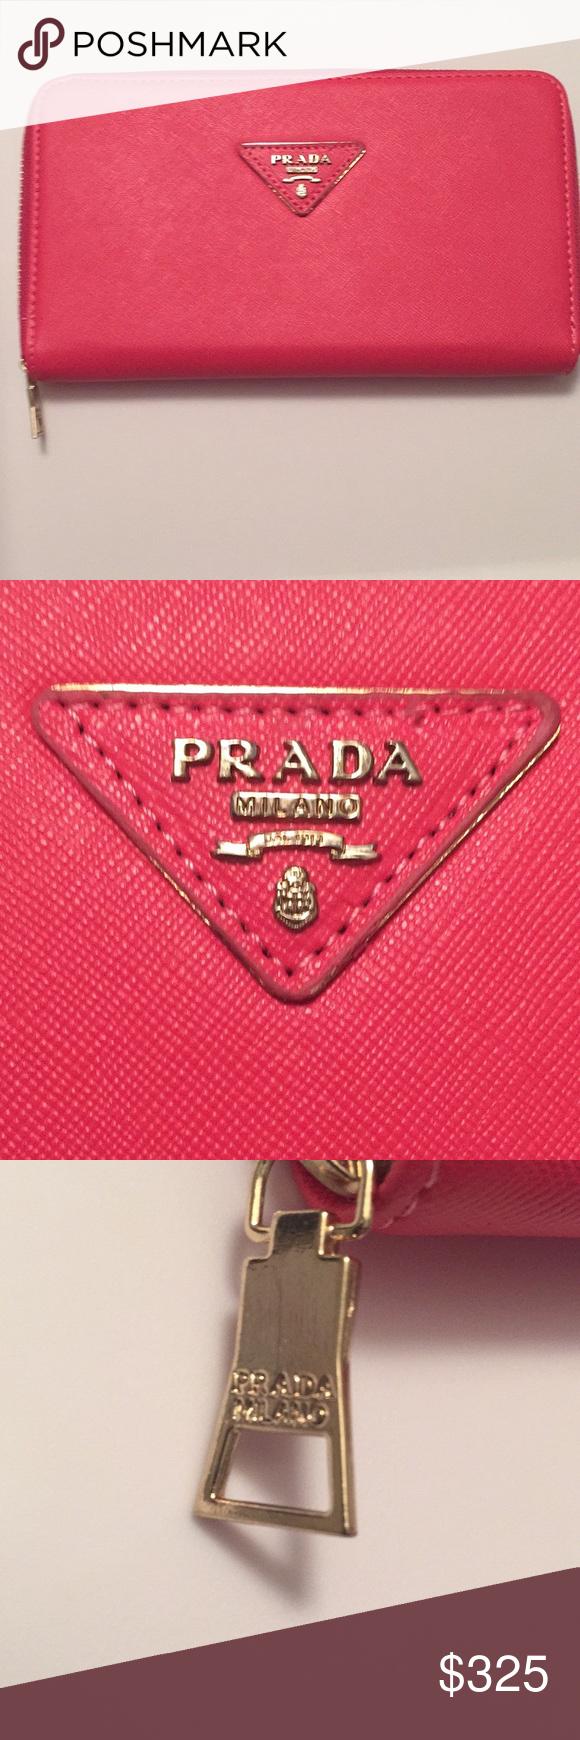 d7b1b41eeb5e75 Pink Prada Saffiano Leather Zip Around Wallet 👛 Pink Prada Saffiano  Leather Zip Around Wallet with triangle Prada logo Clutch, zipper wallet  EUC Multi ...